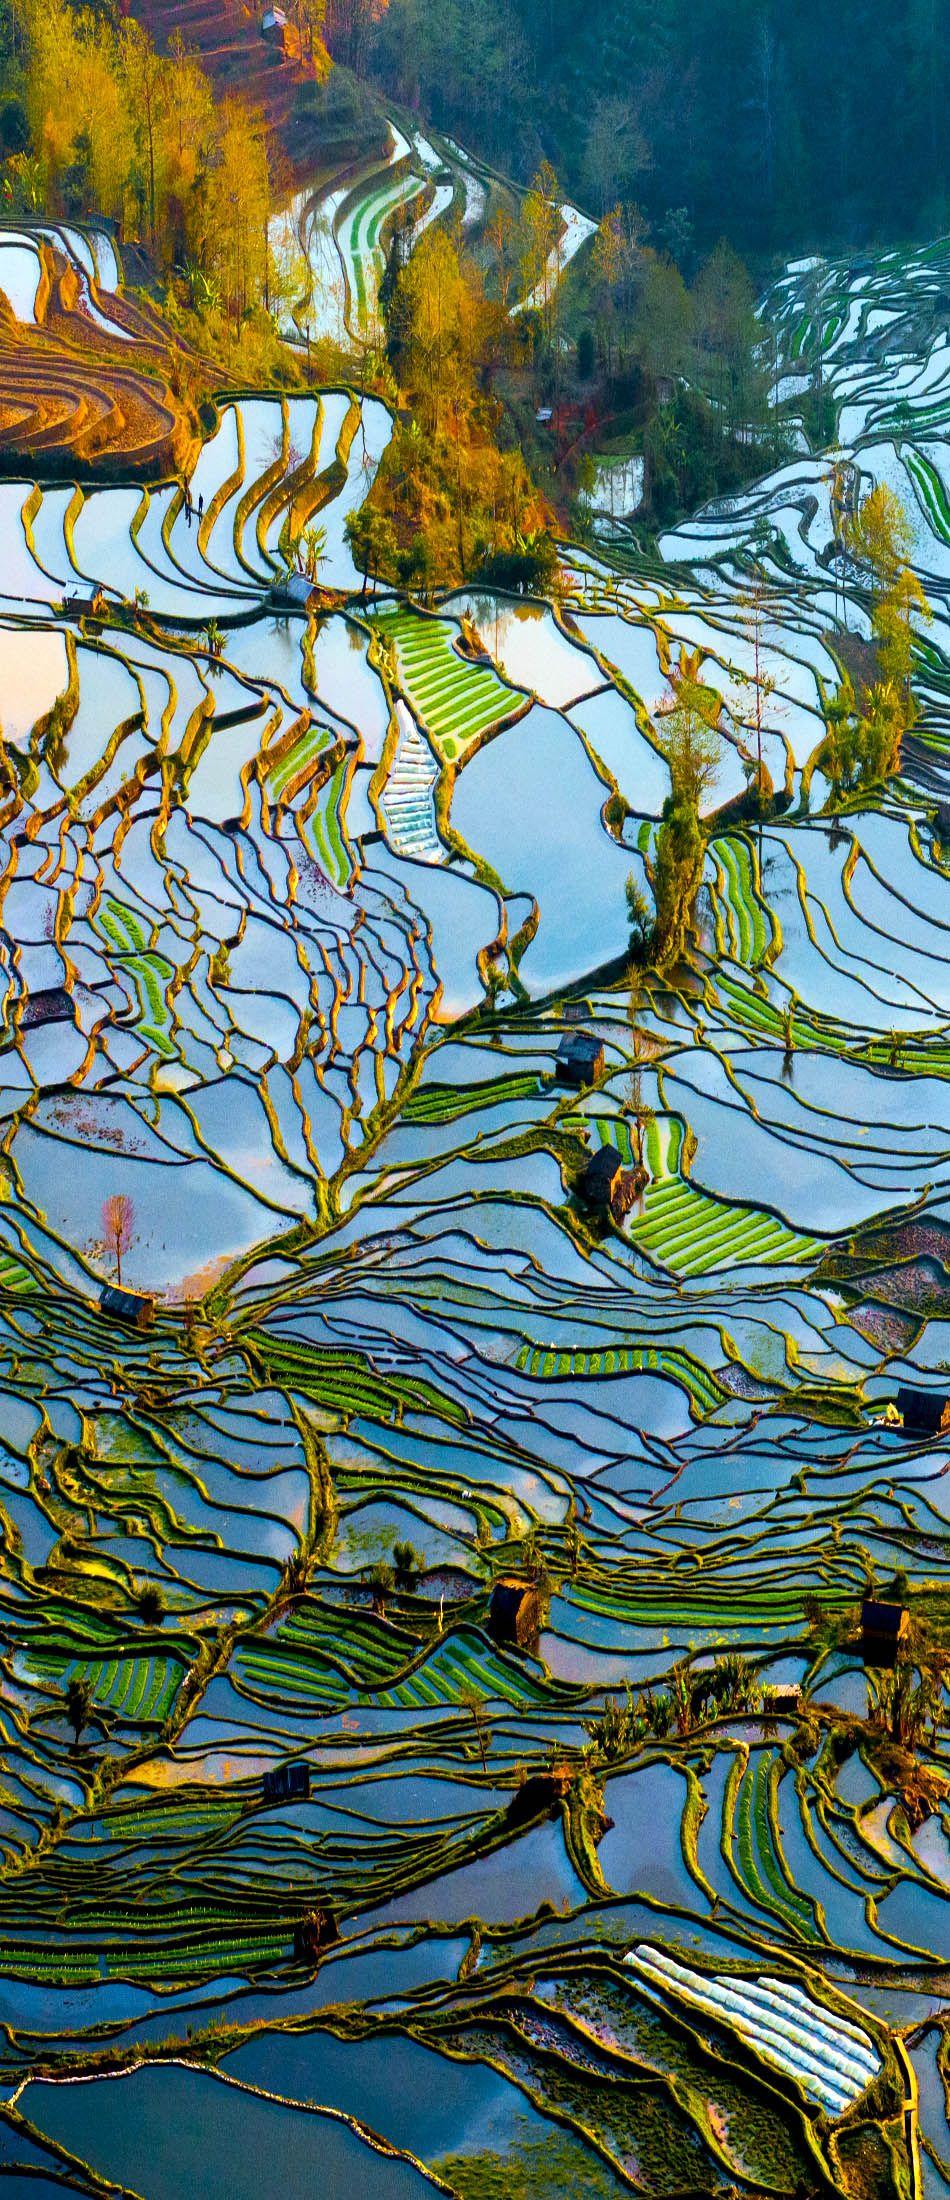 17 Unbelivably Photos Of Rice Fields Stunning No 15 Fotografia Paisaje Paisajes Y Hermosos Paisajes